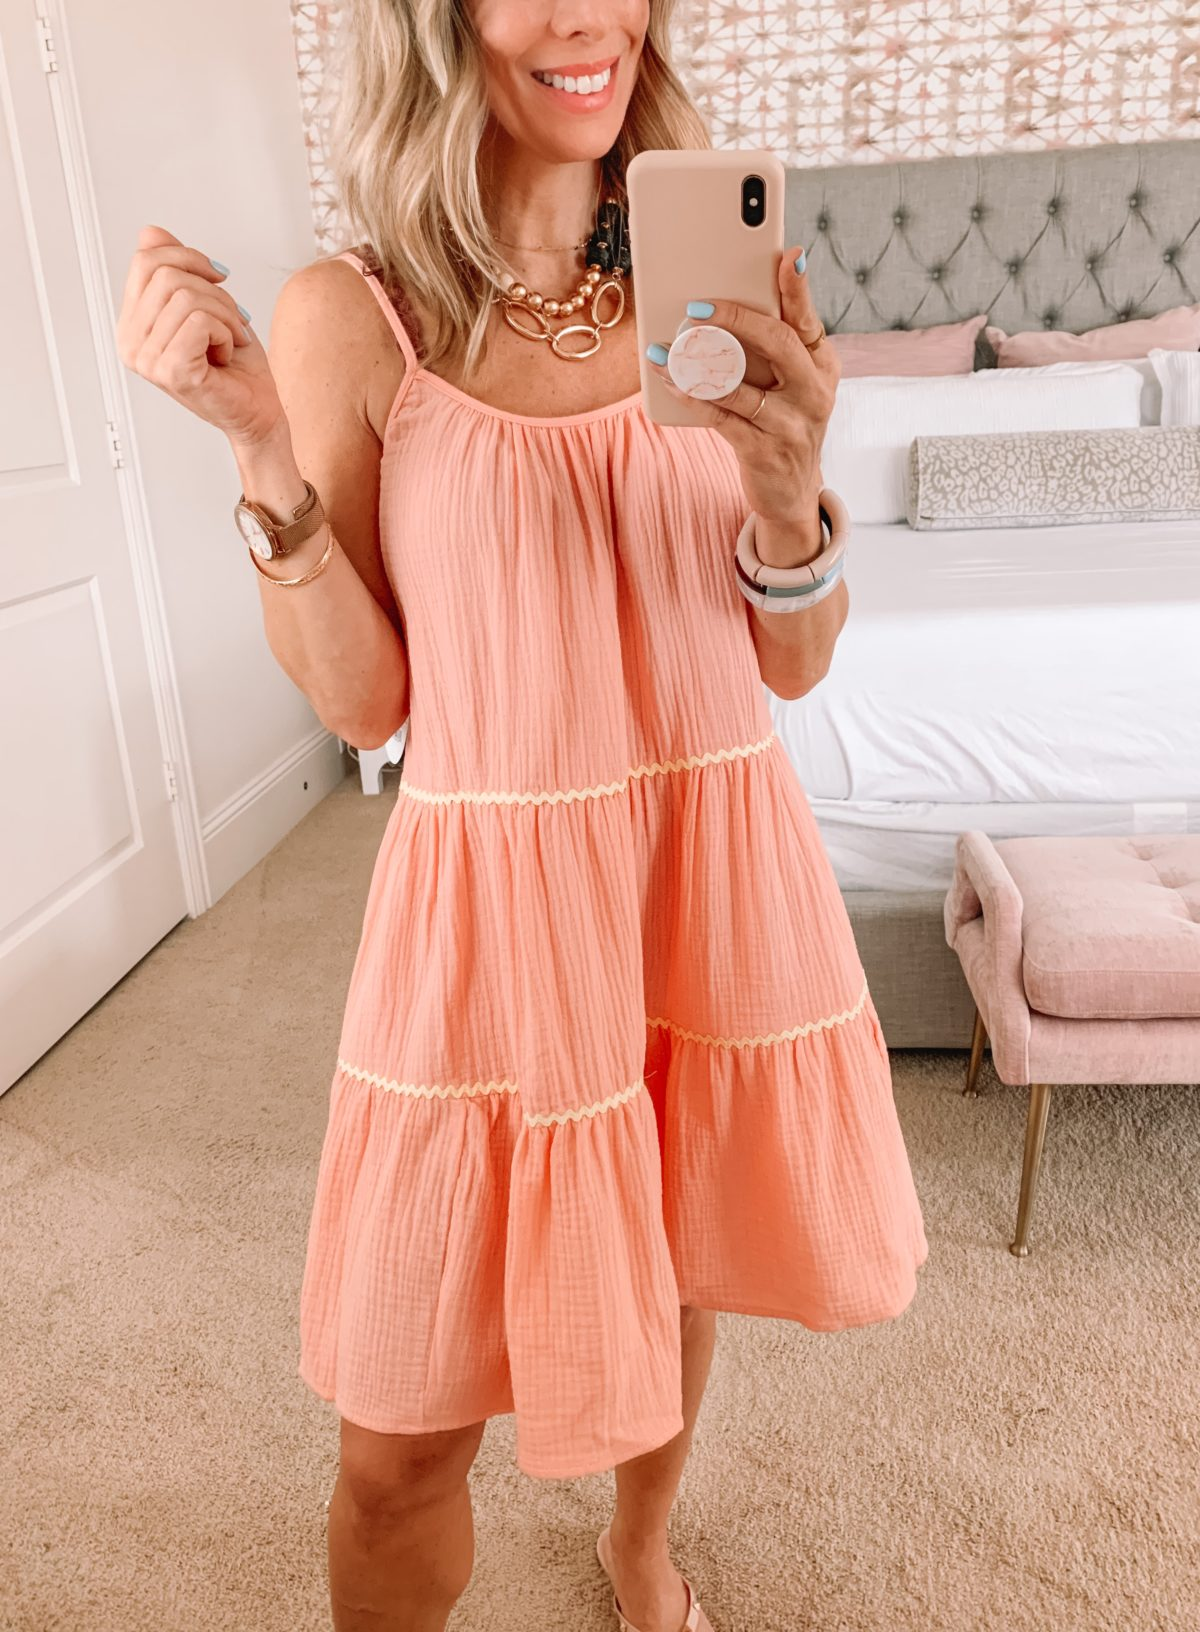 Dressing Room Finds, Orange Tiered Dress, Bow Sandals